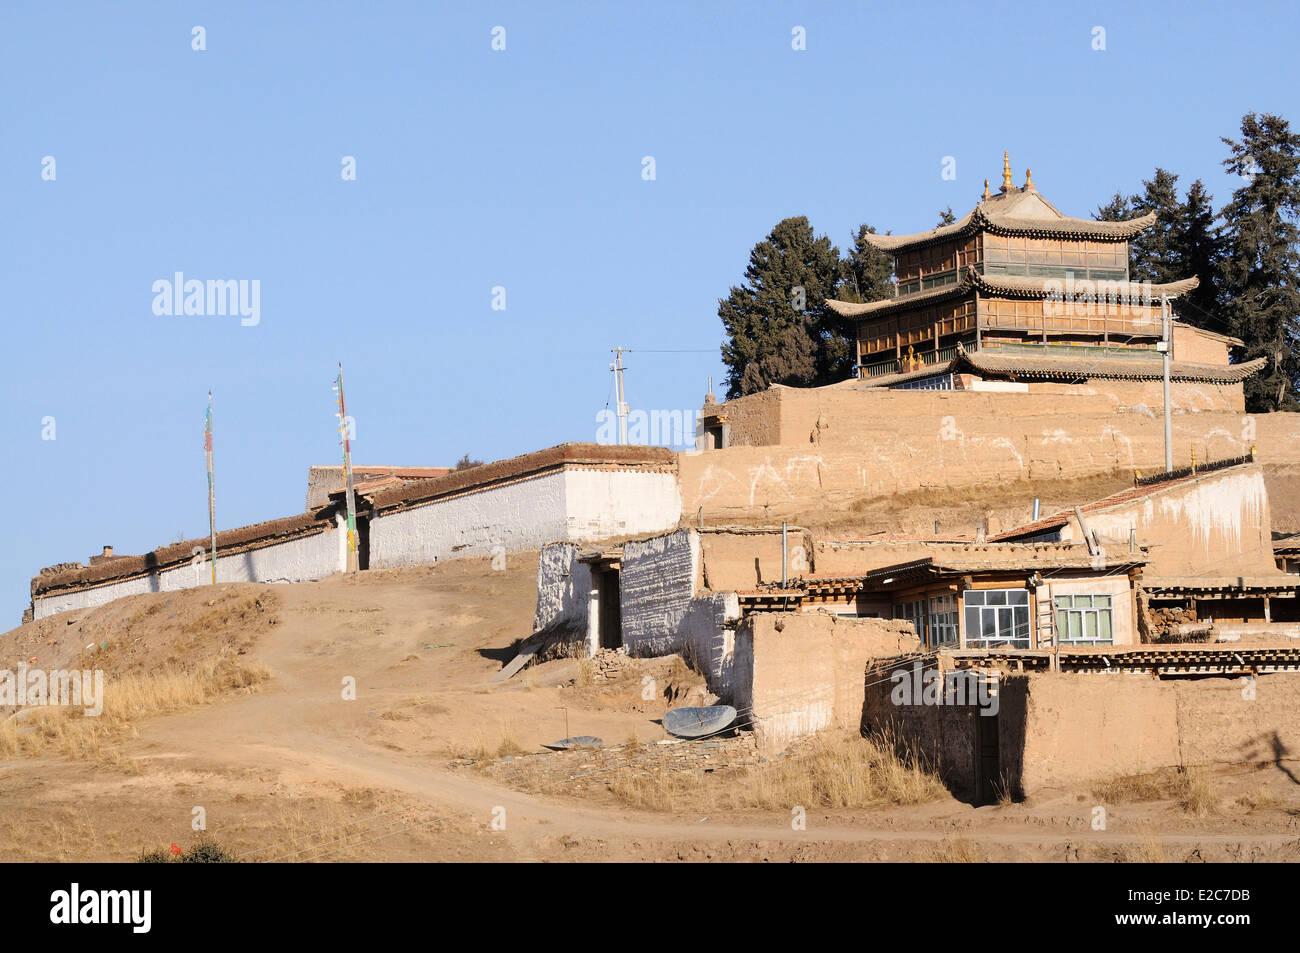 La Chine, la Province de Qinghai, Amdo, Tongren (Rebkong) comté, Tashi Kyil monastery Photo Stock